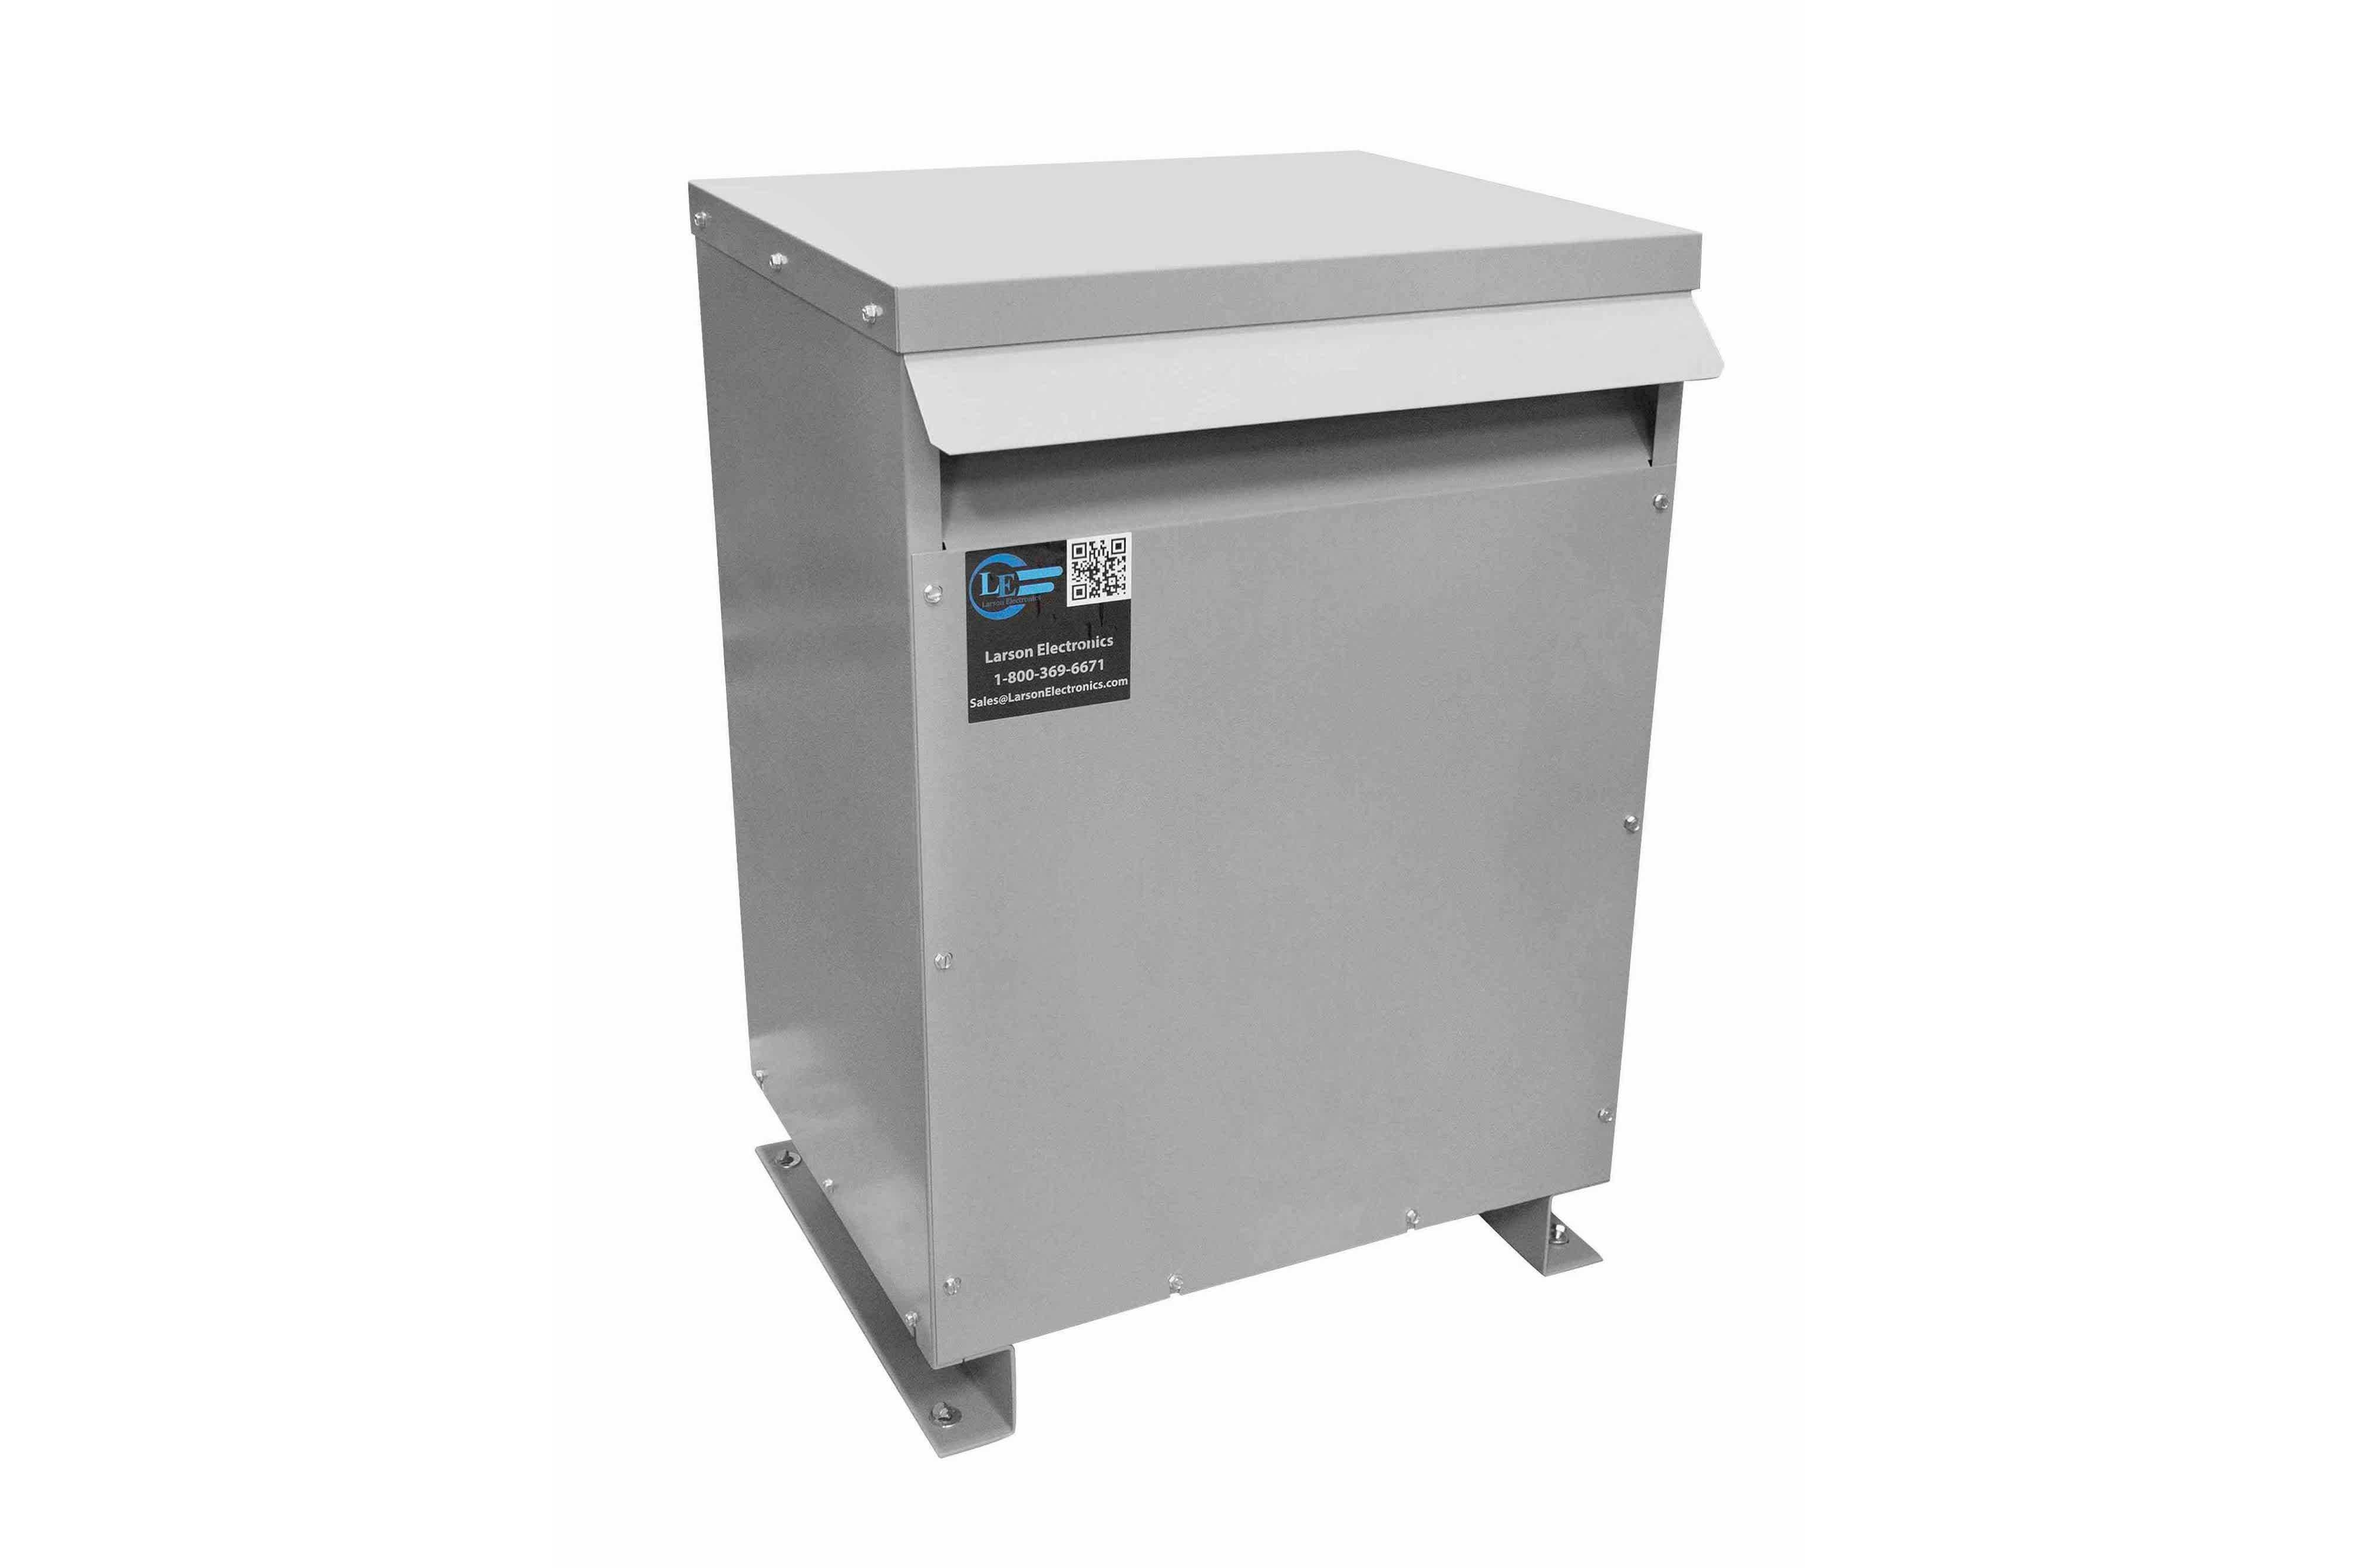 45 kVA 3PH Isolation Transformer, 380V Wye Primary, 480Y/277 Wye-N Secondary, N3R, Ventilated, 60 Hz